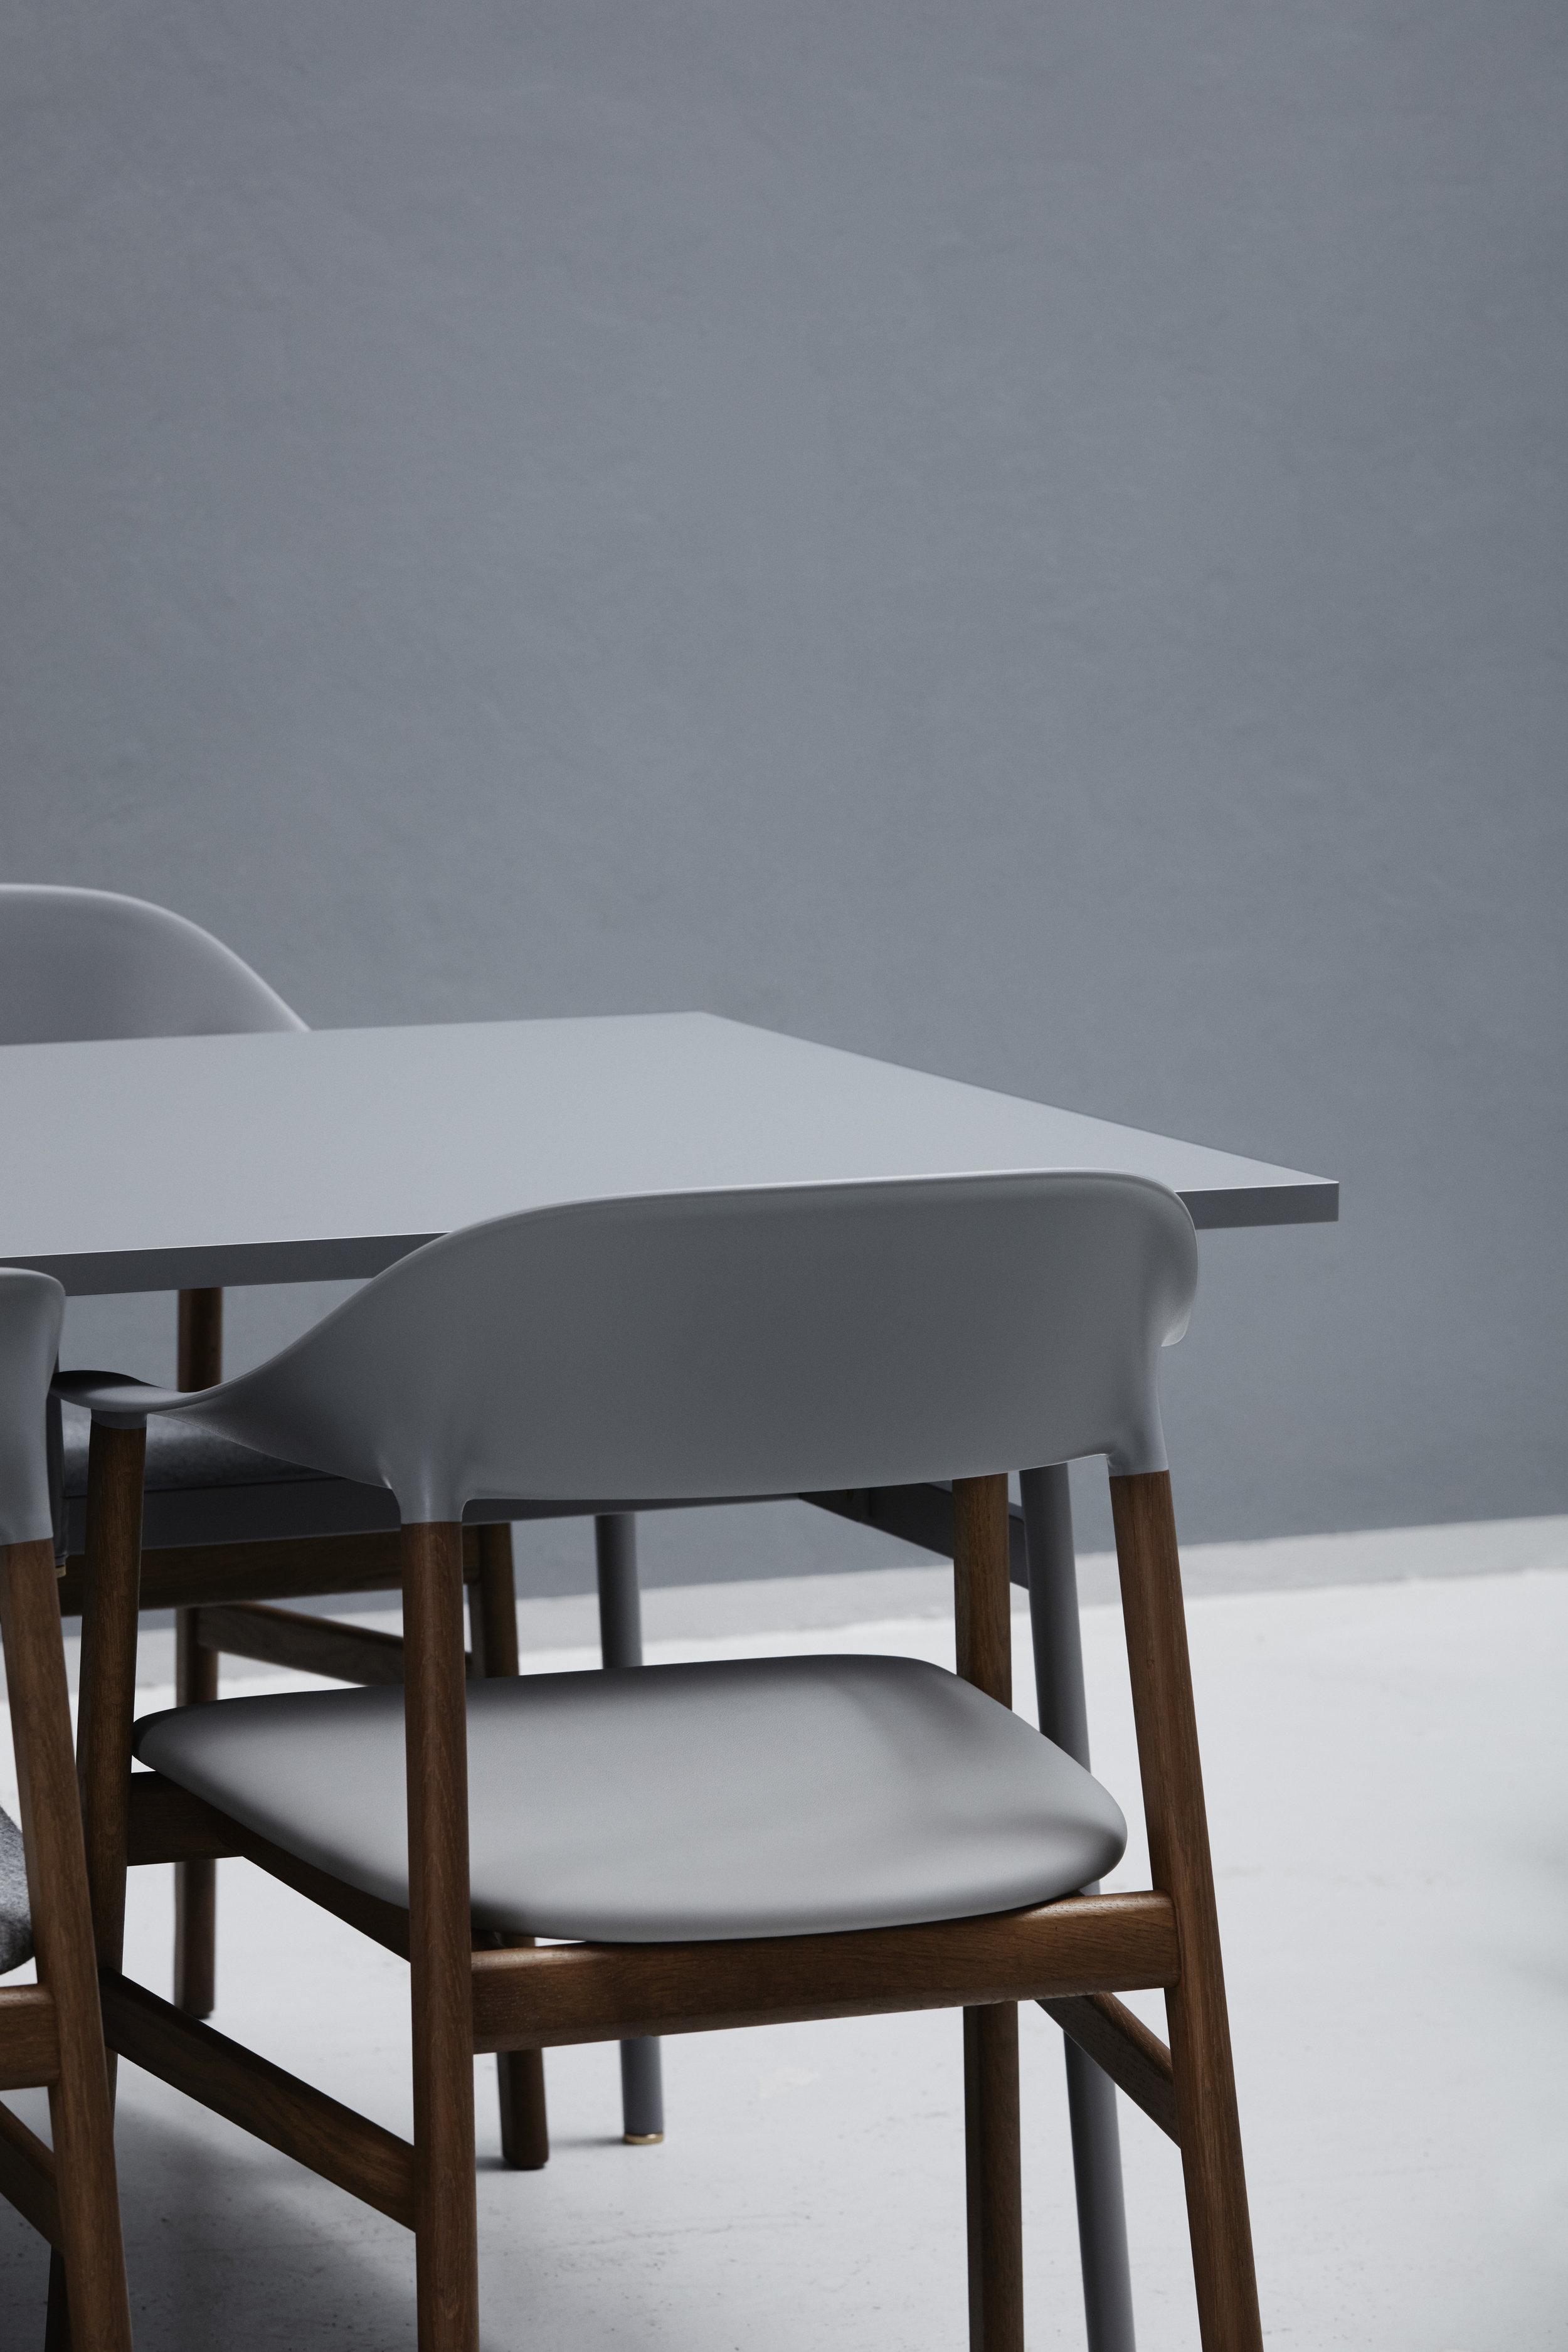 Image Credit: Normann Copenhagen - Herit Chair